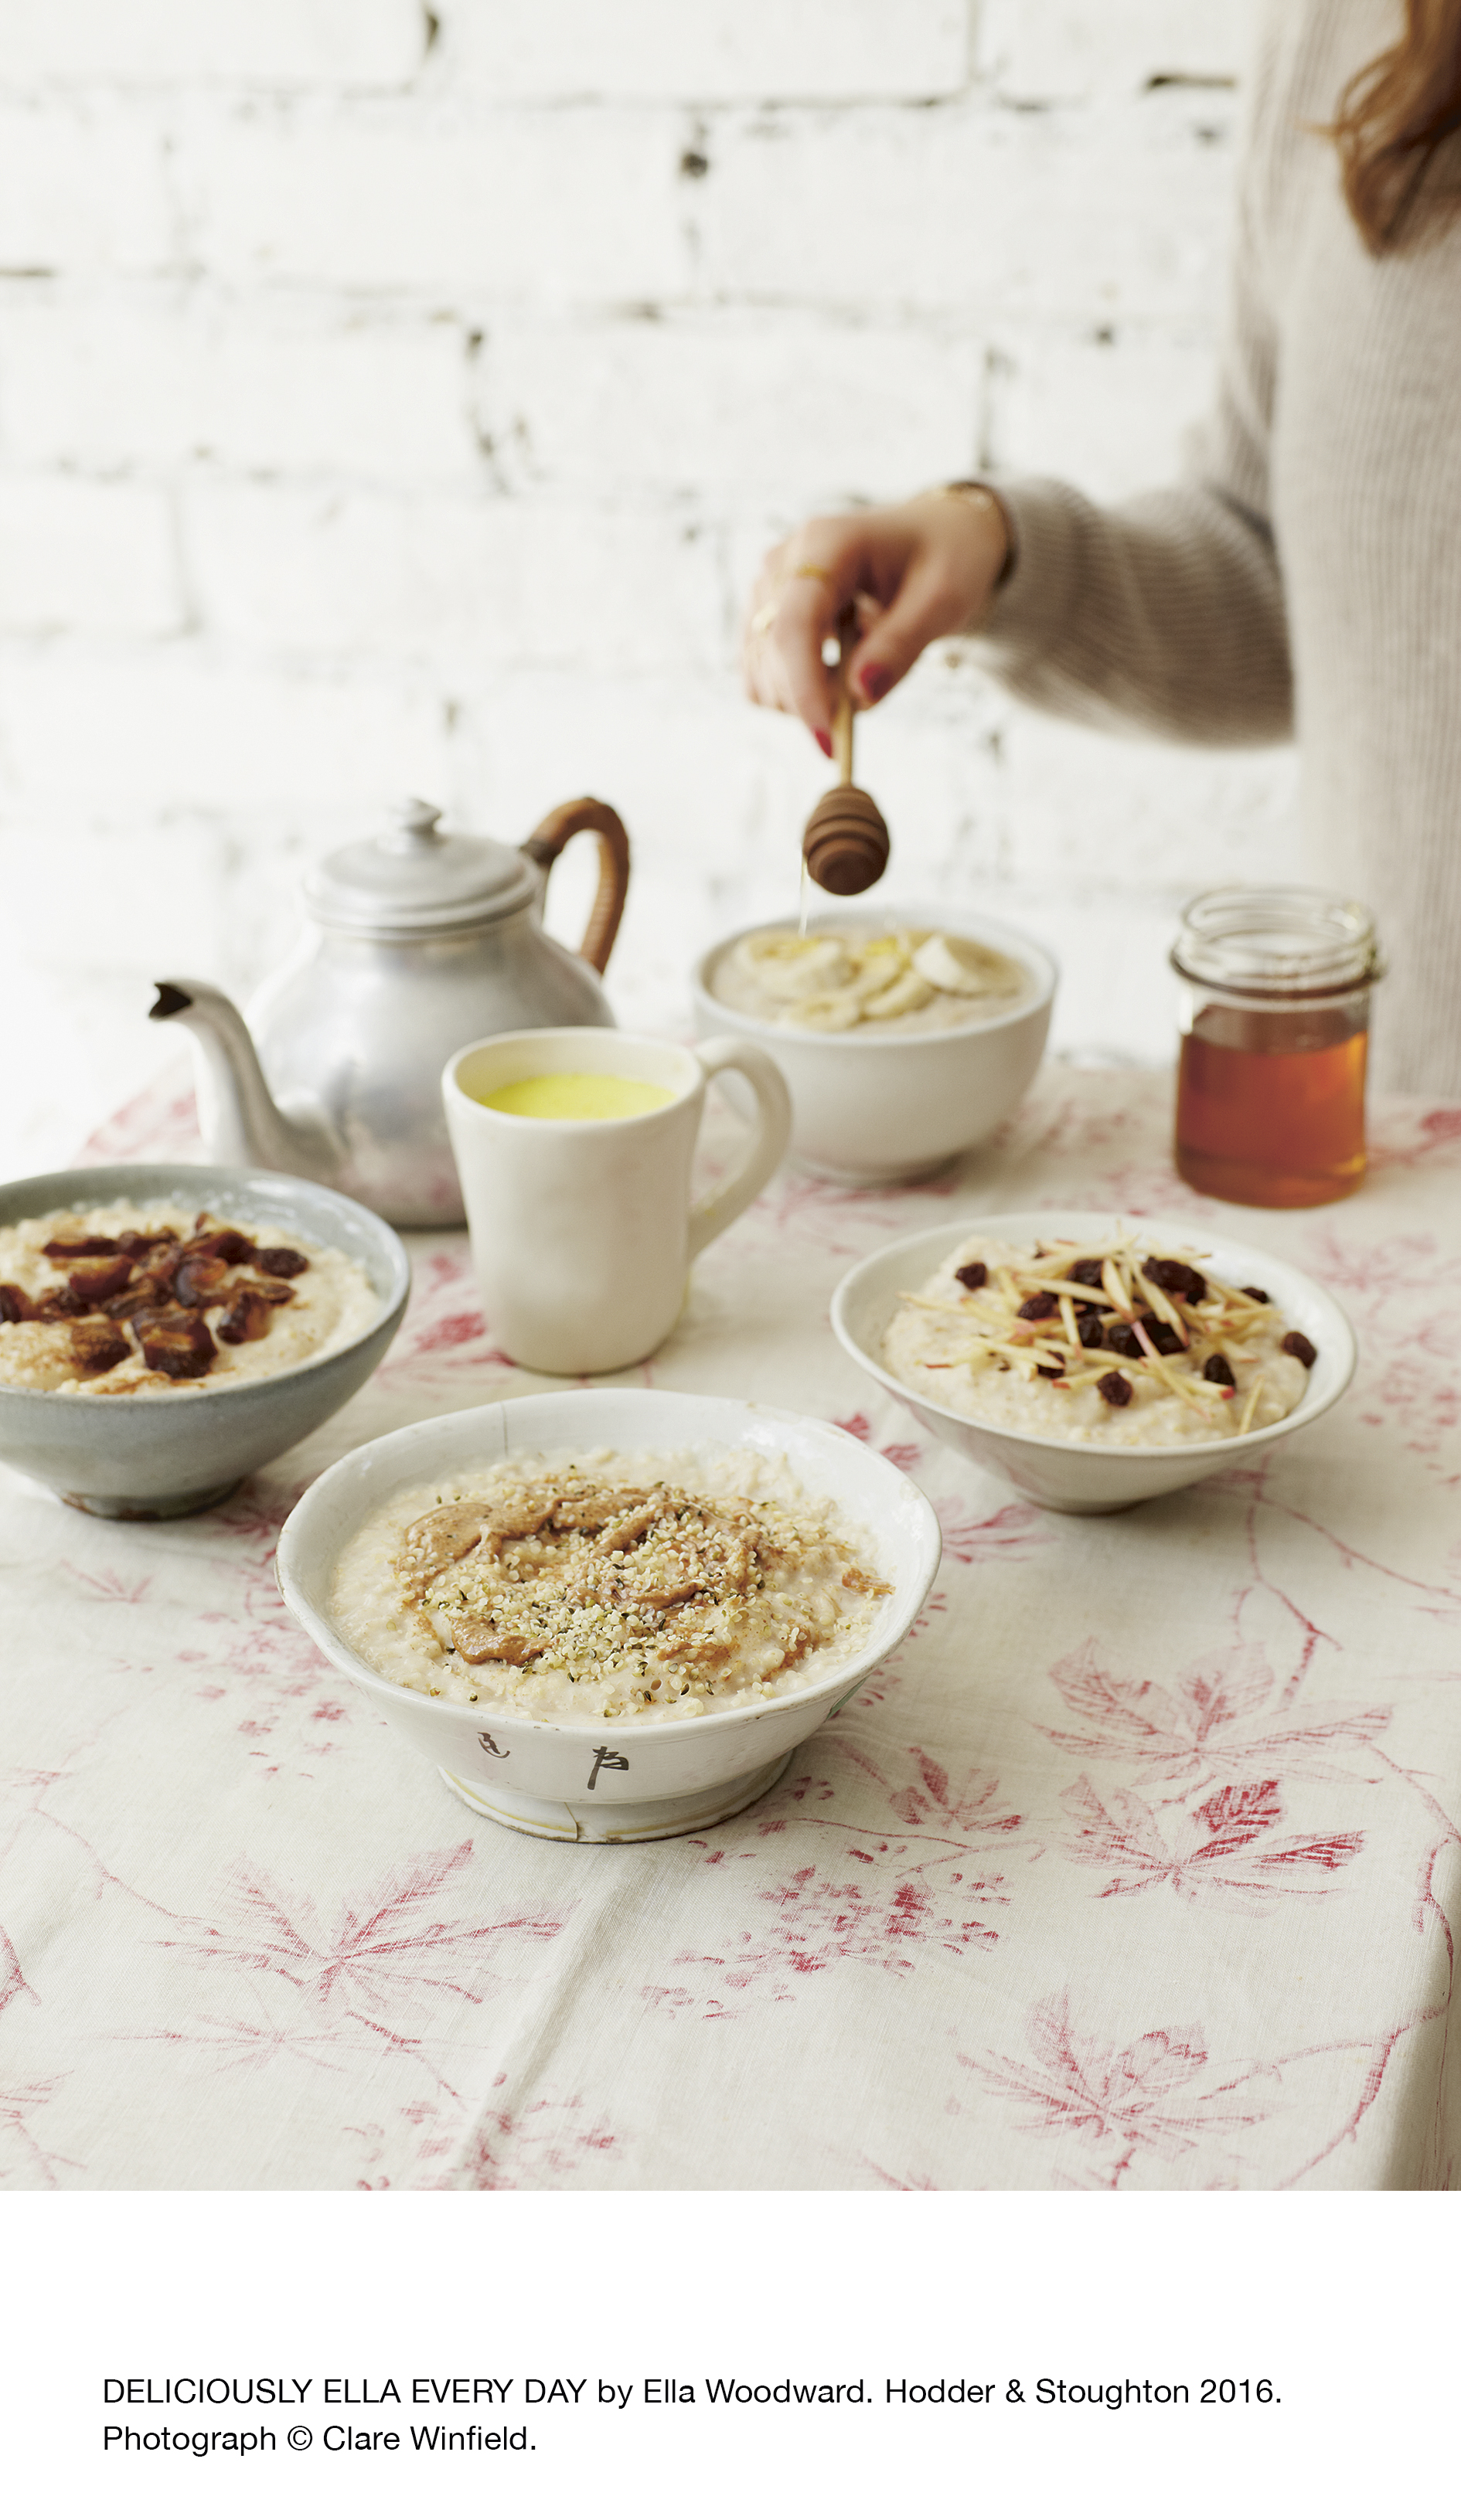 Deliciously Ella's Almond Butter And Hemp Speedy Porridge